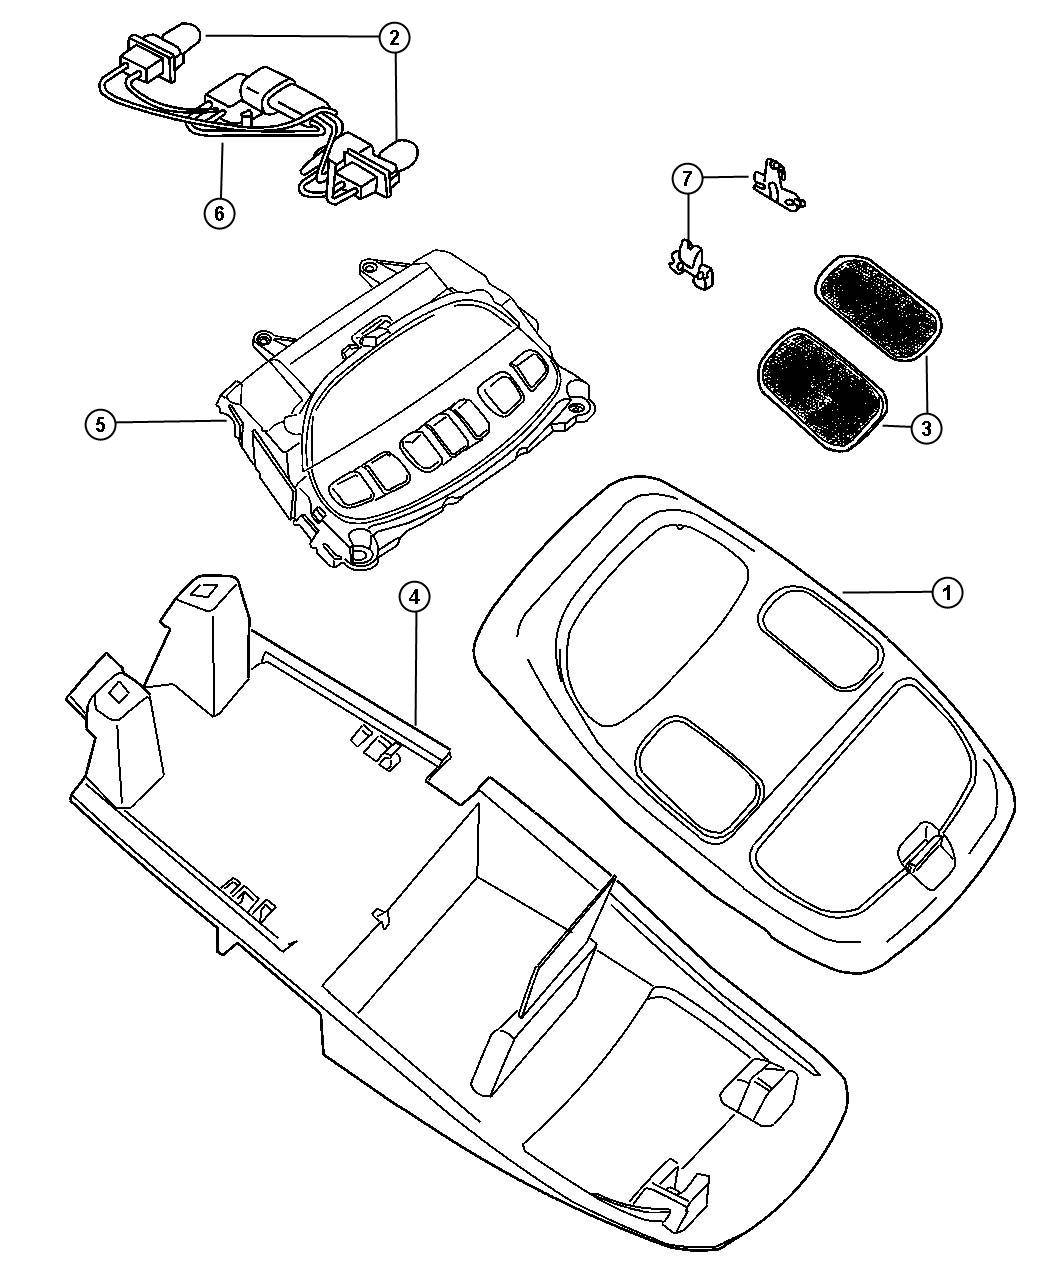 2008 Dodge Ram 5500 Wiring  Overhead Console  Trim   All Trim Codes